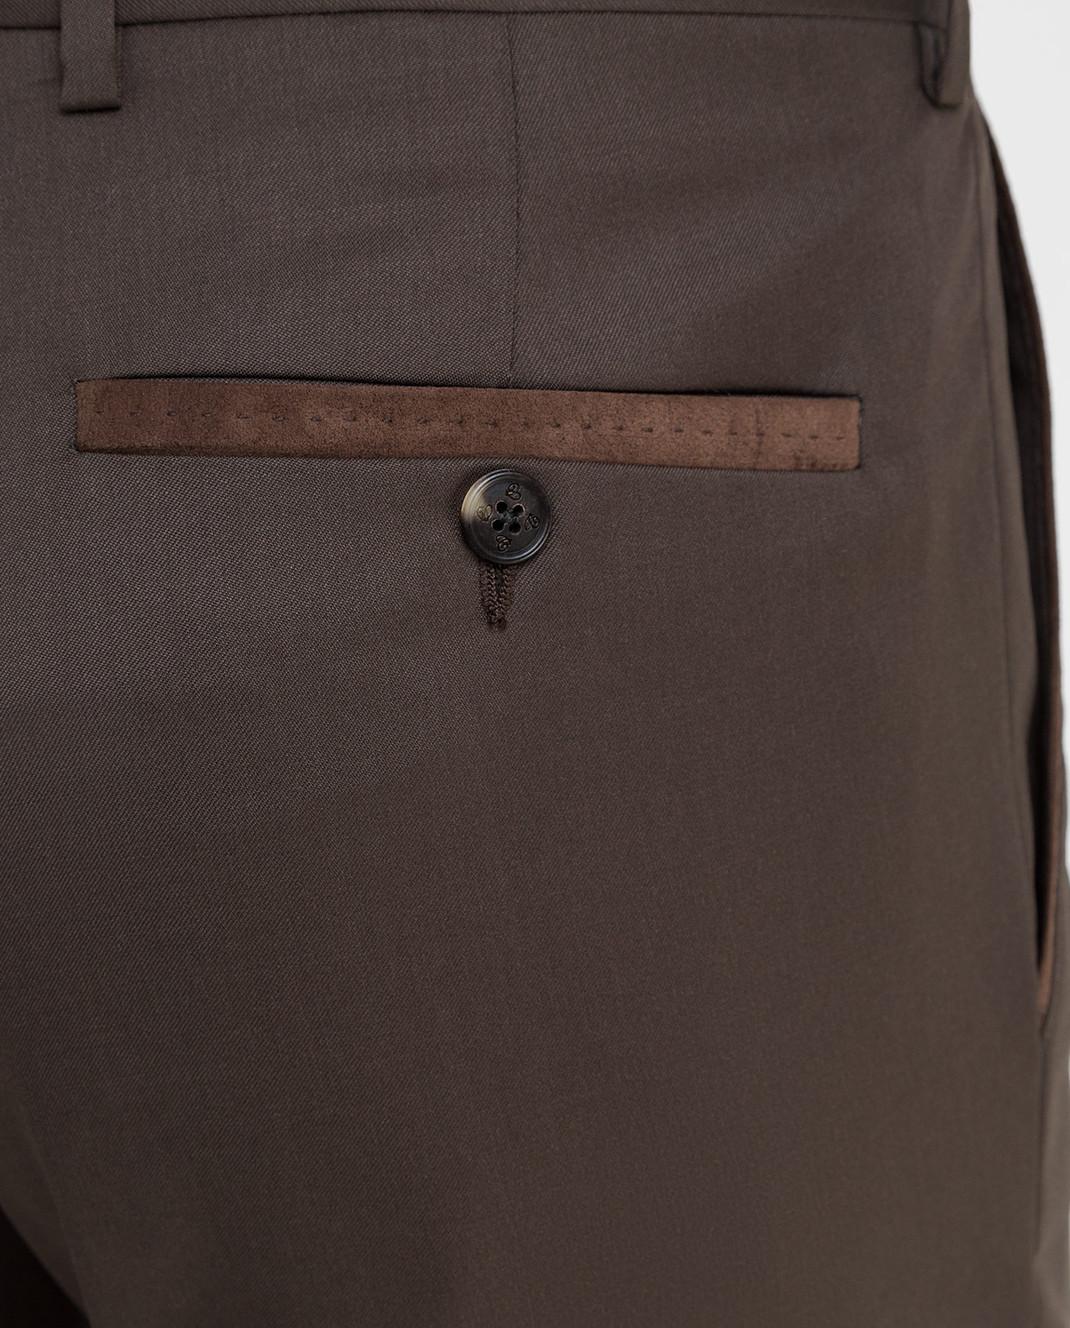 Castello d'Oro Темно-коричневые брюки из шерсти изображение 5